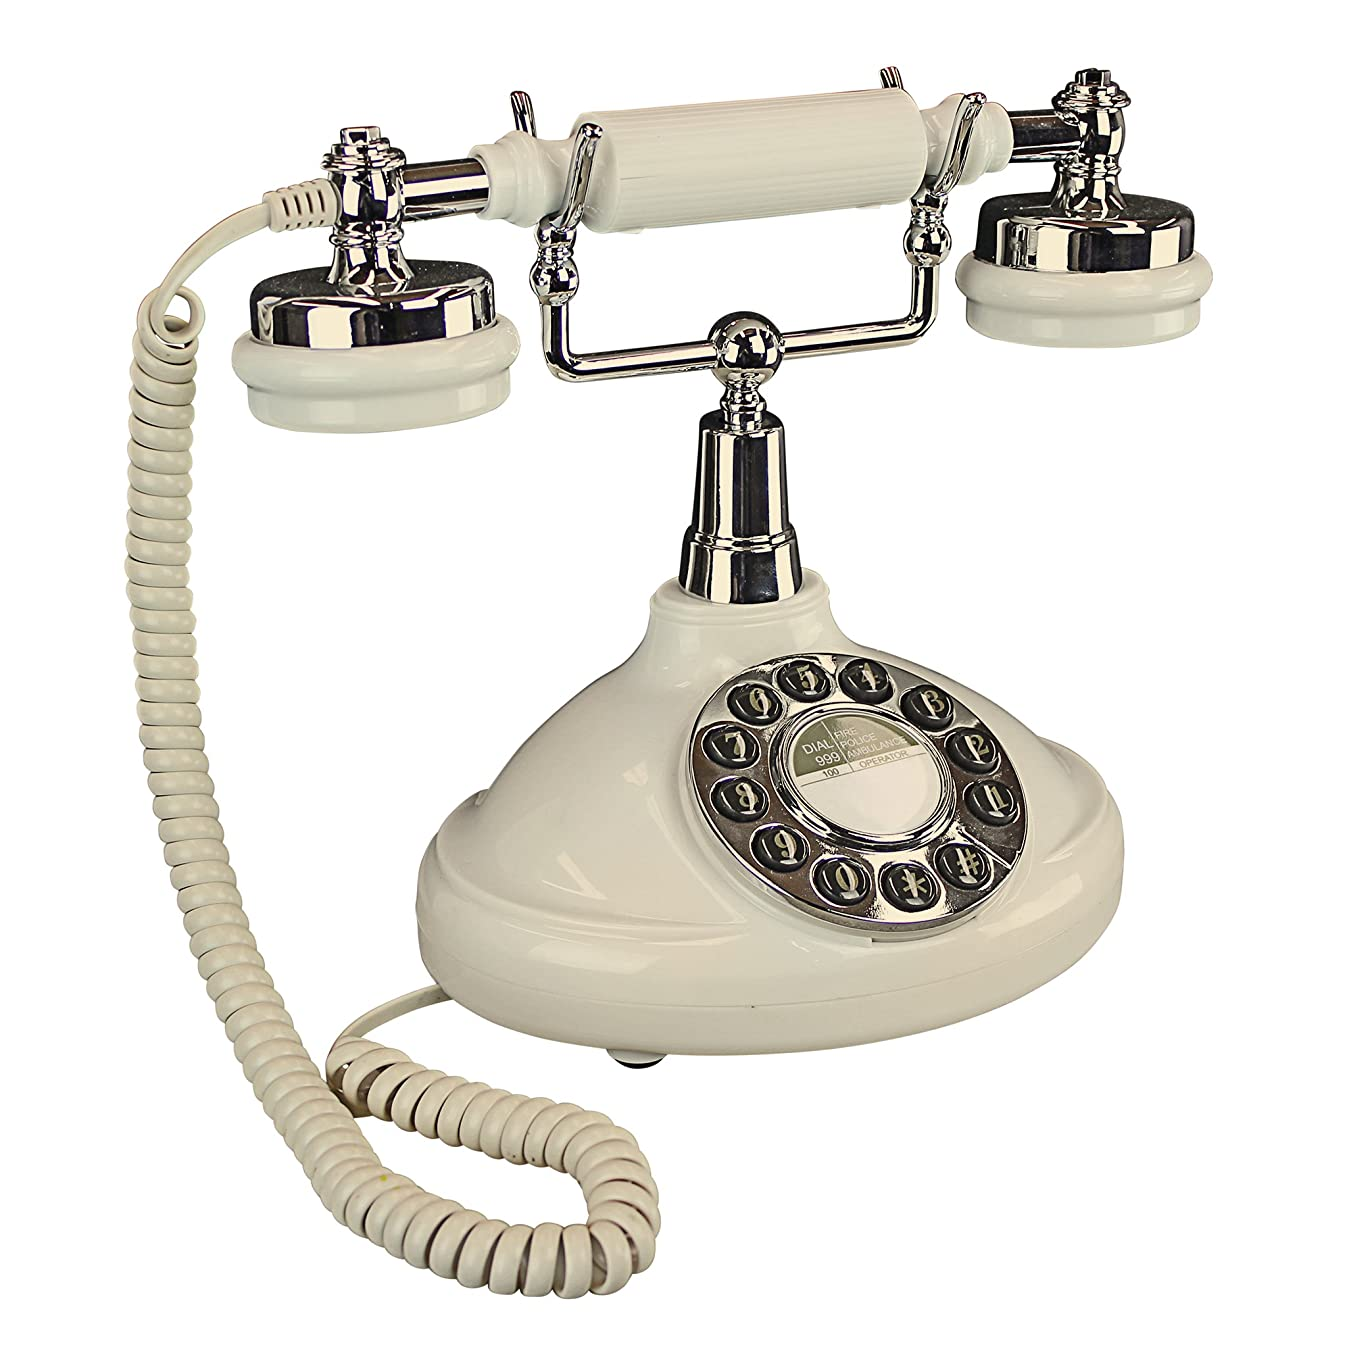 Design Toscano Brittany Neophone 1929 Rotary Corded Retro Phone - Vintage Decorative Telephones, one Size, White